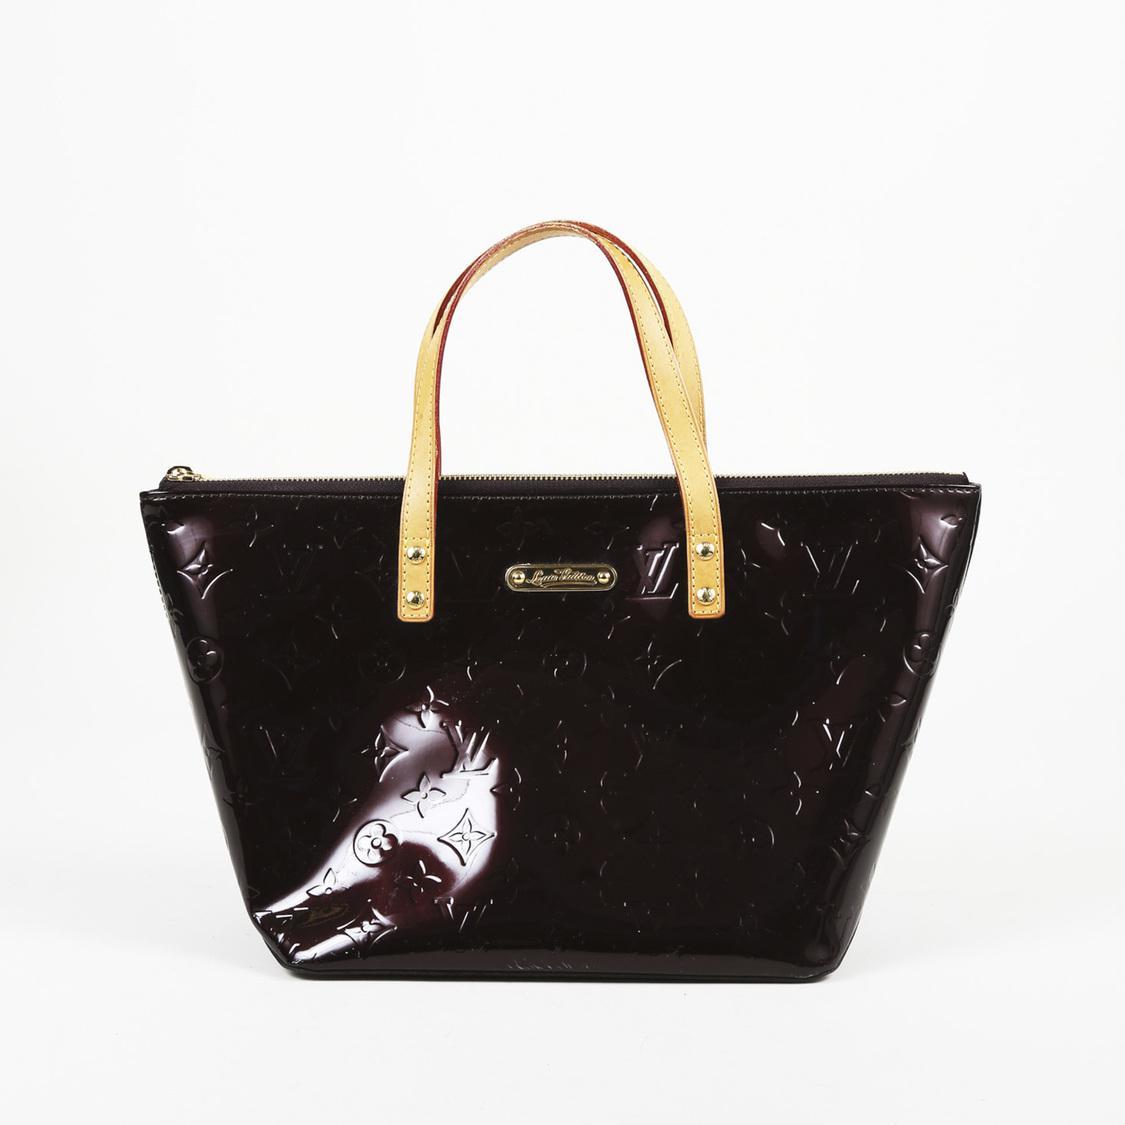 021e5c67c0b0 Lyst - Louis Vuitton Monogram Vernis Leather